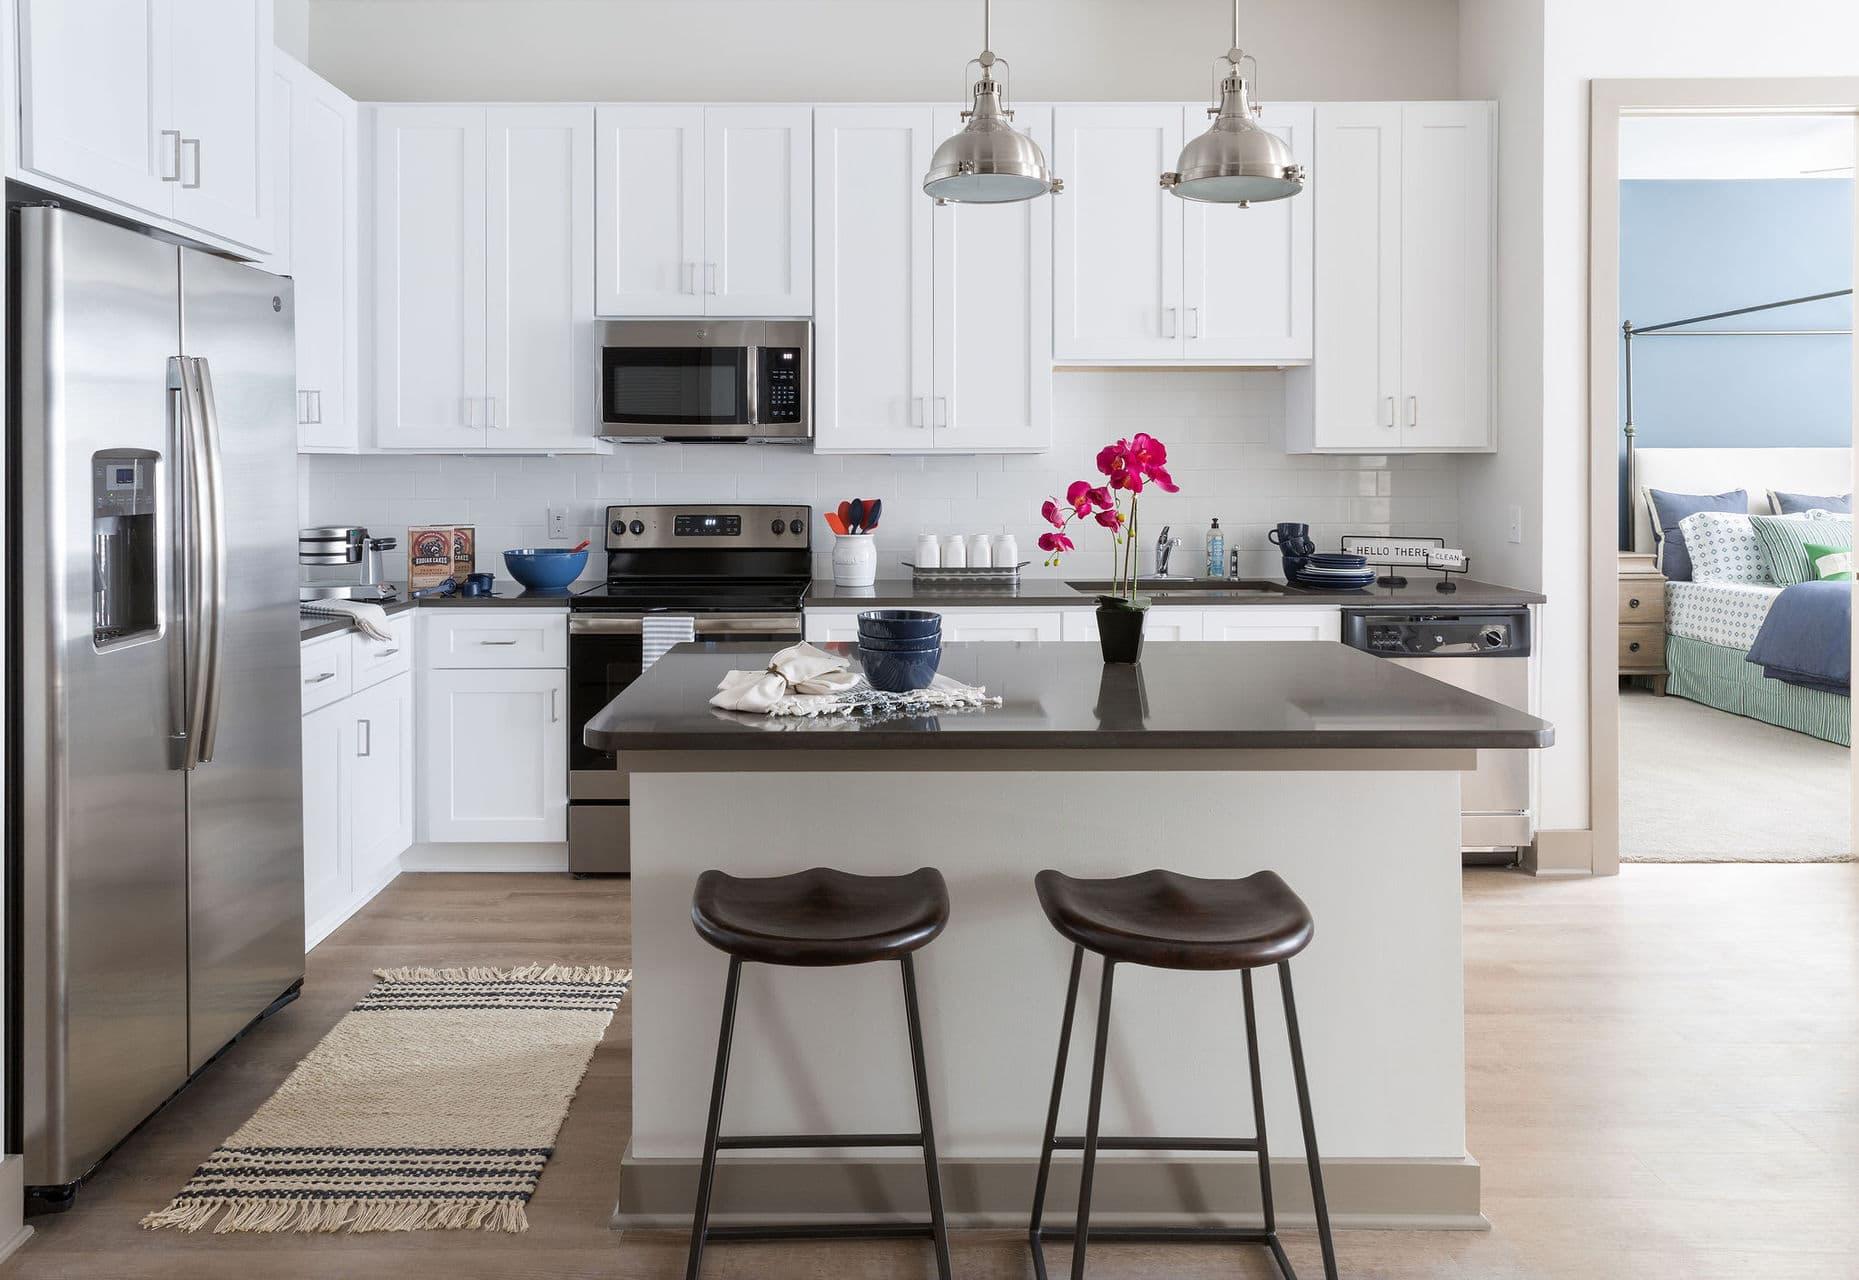 kitchen appliances bar stool